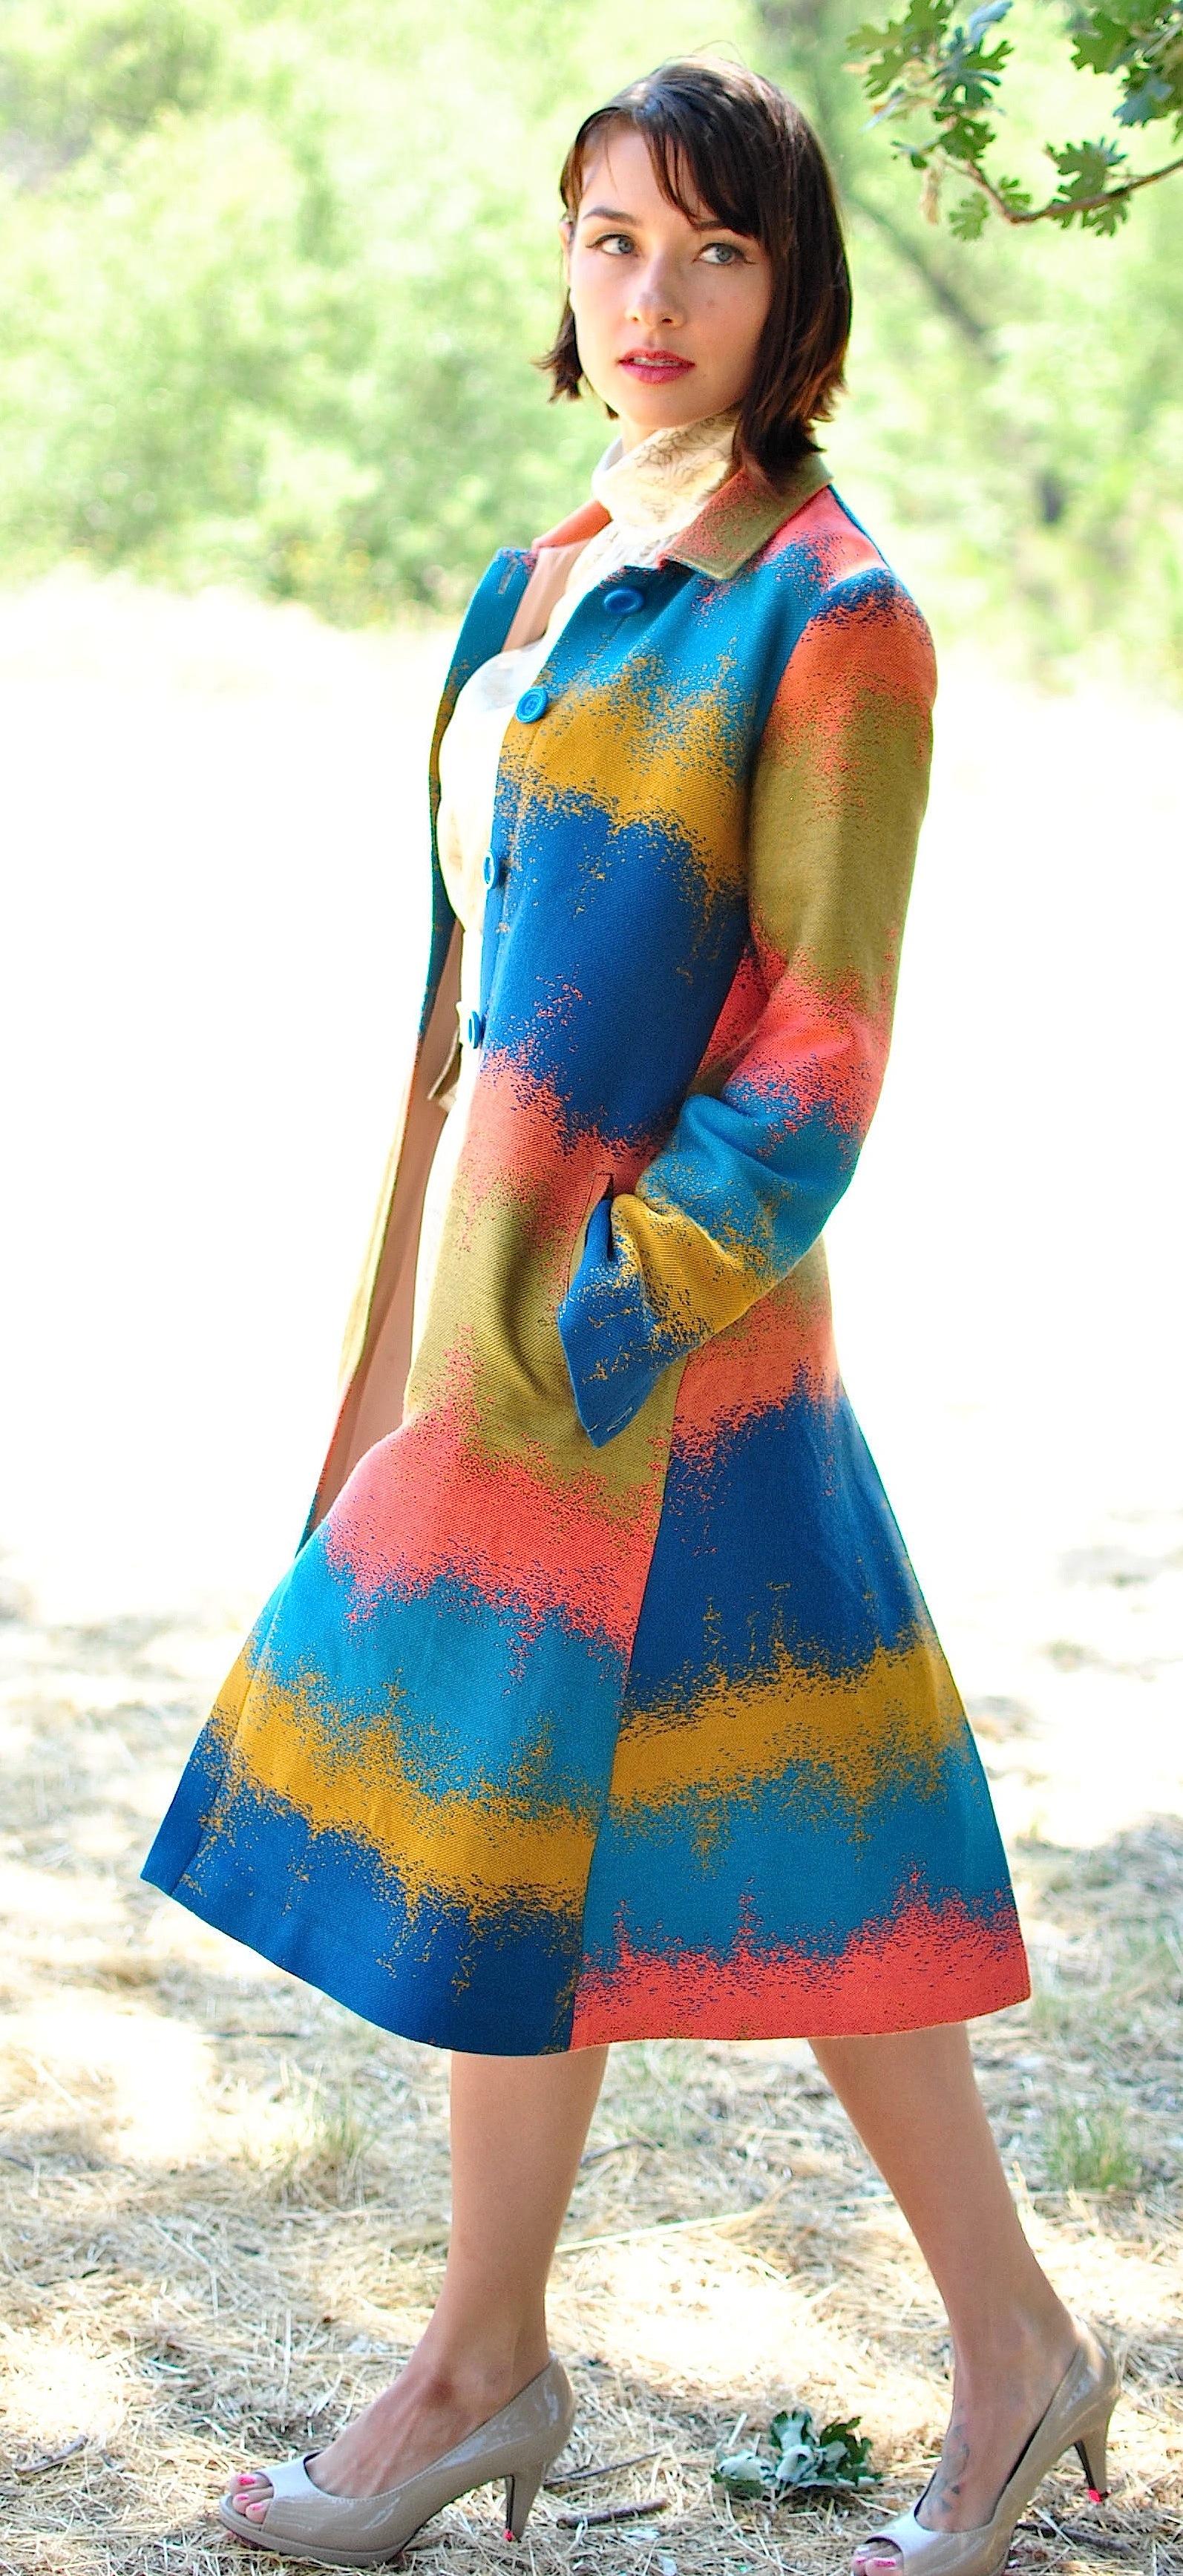 #120 Multicolored Couture Jacquard Car-Coat